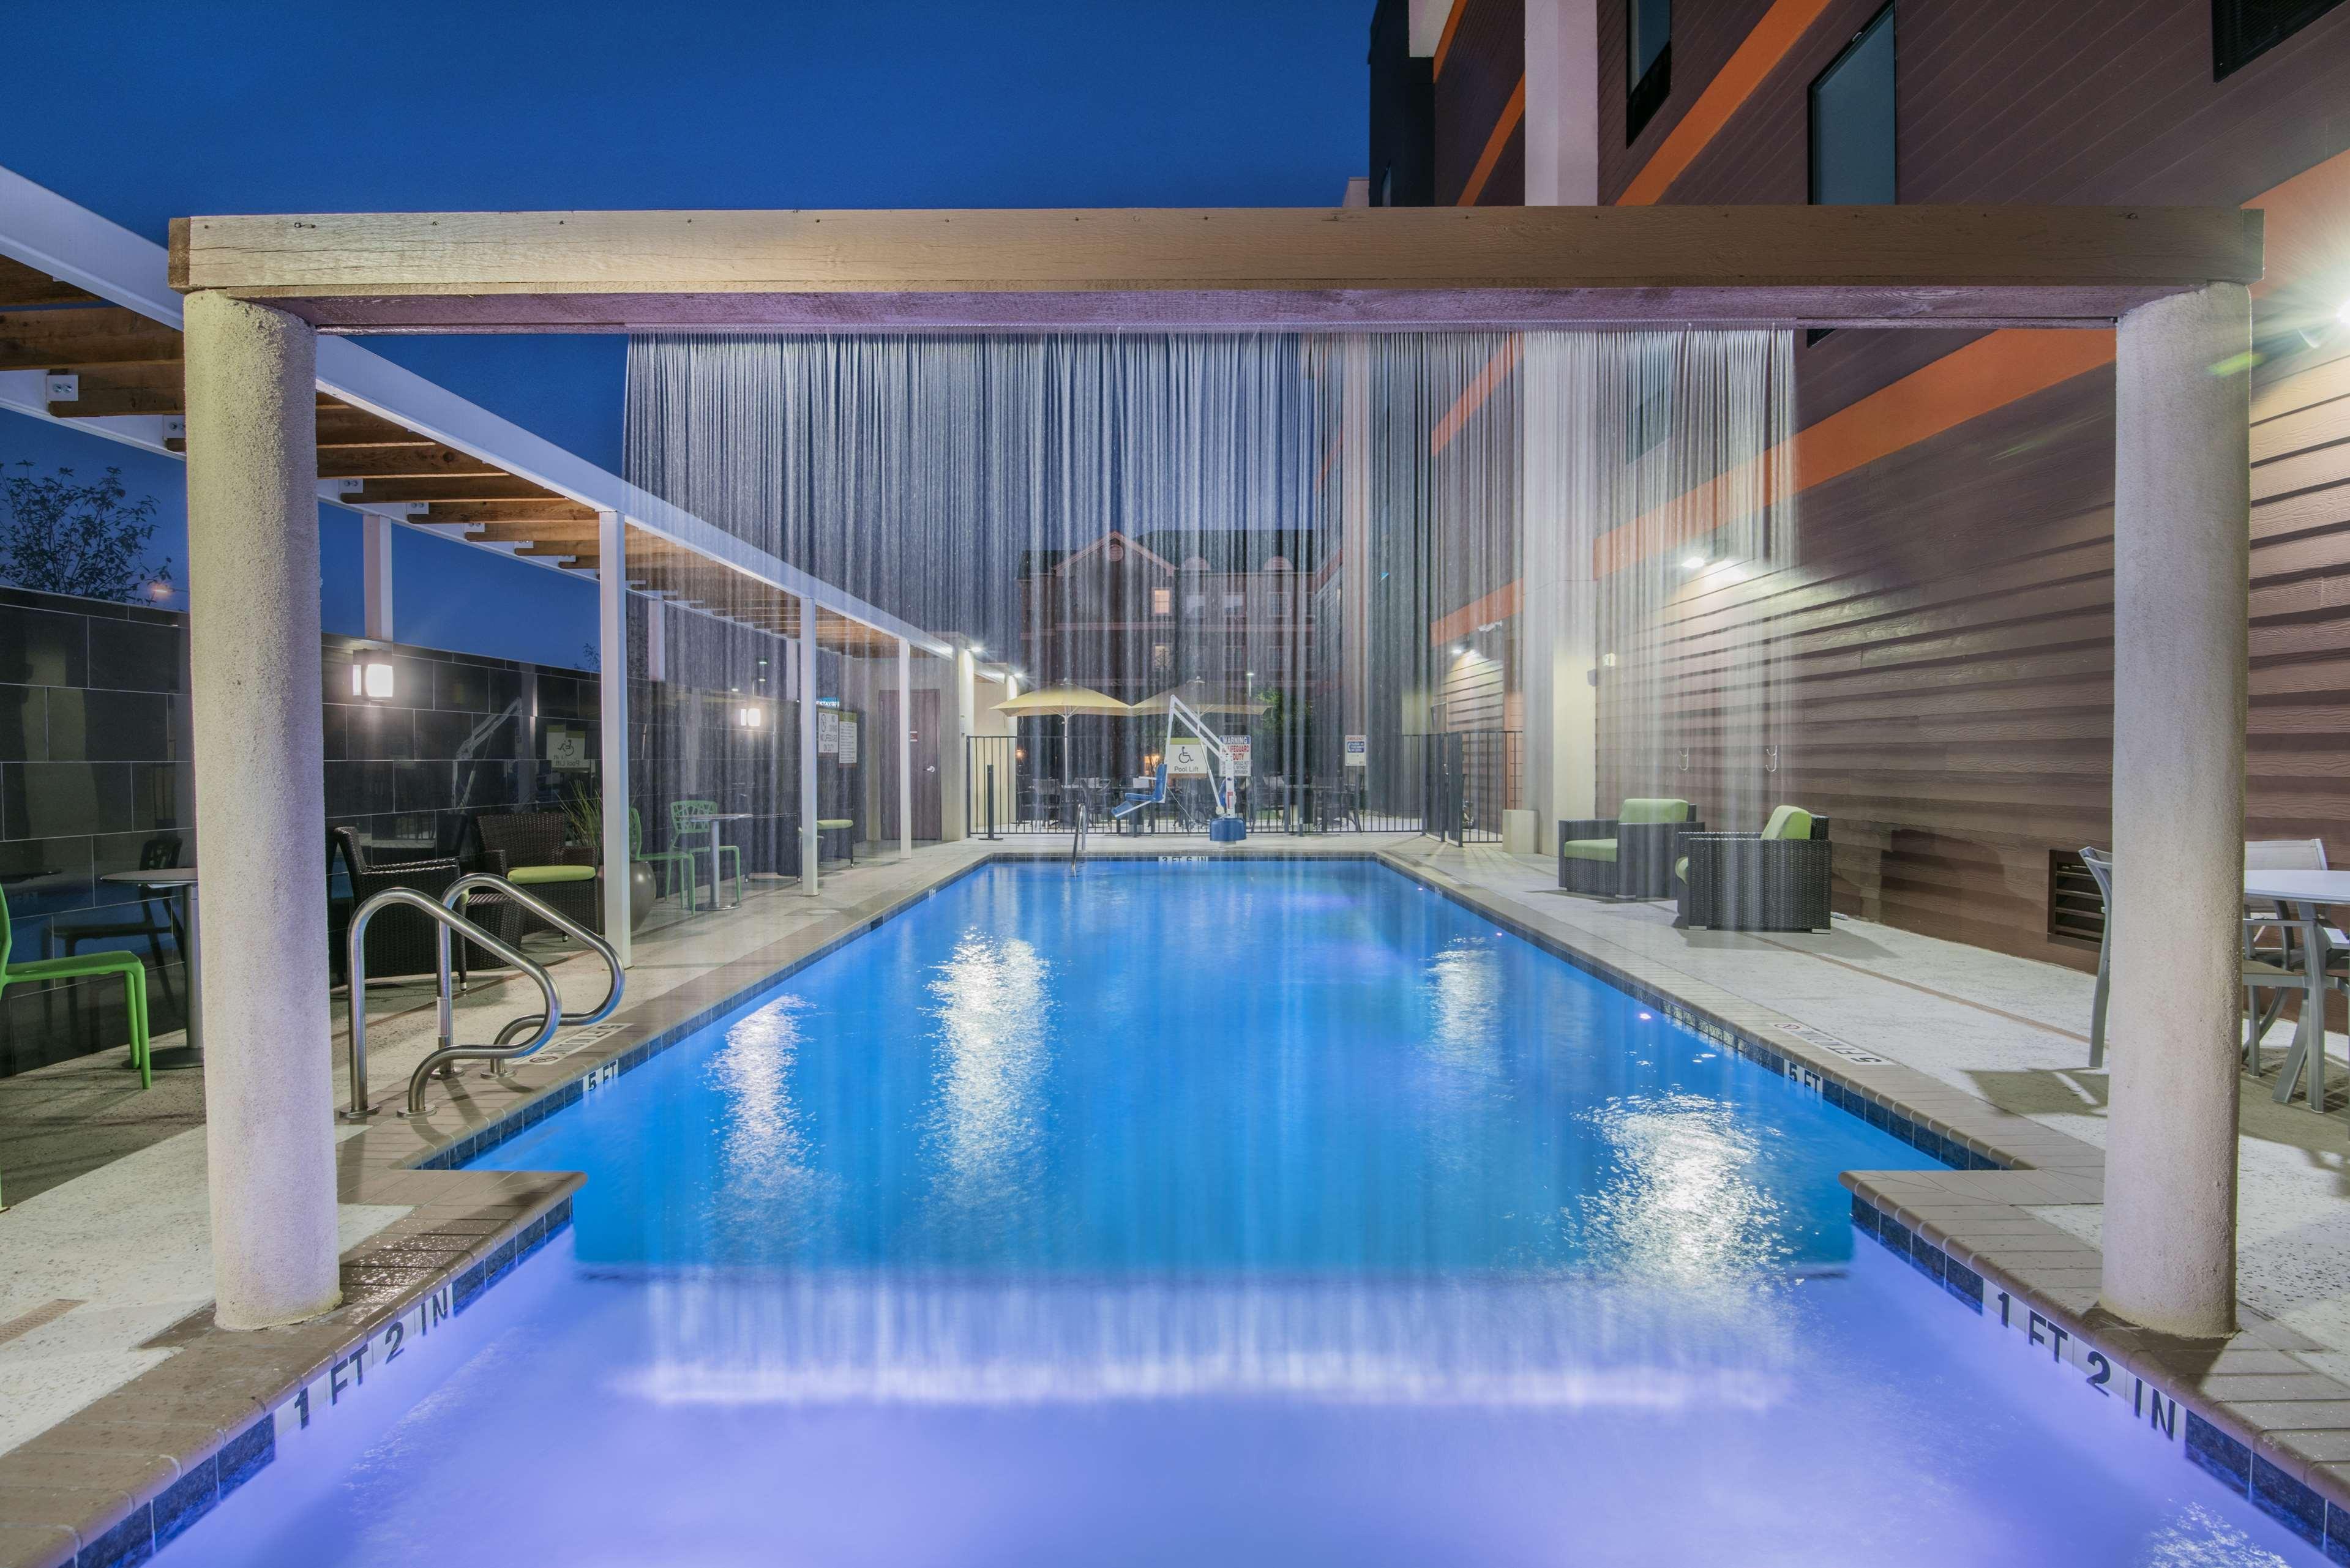 Home2 Suites by Hilton Austin Airport image 9